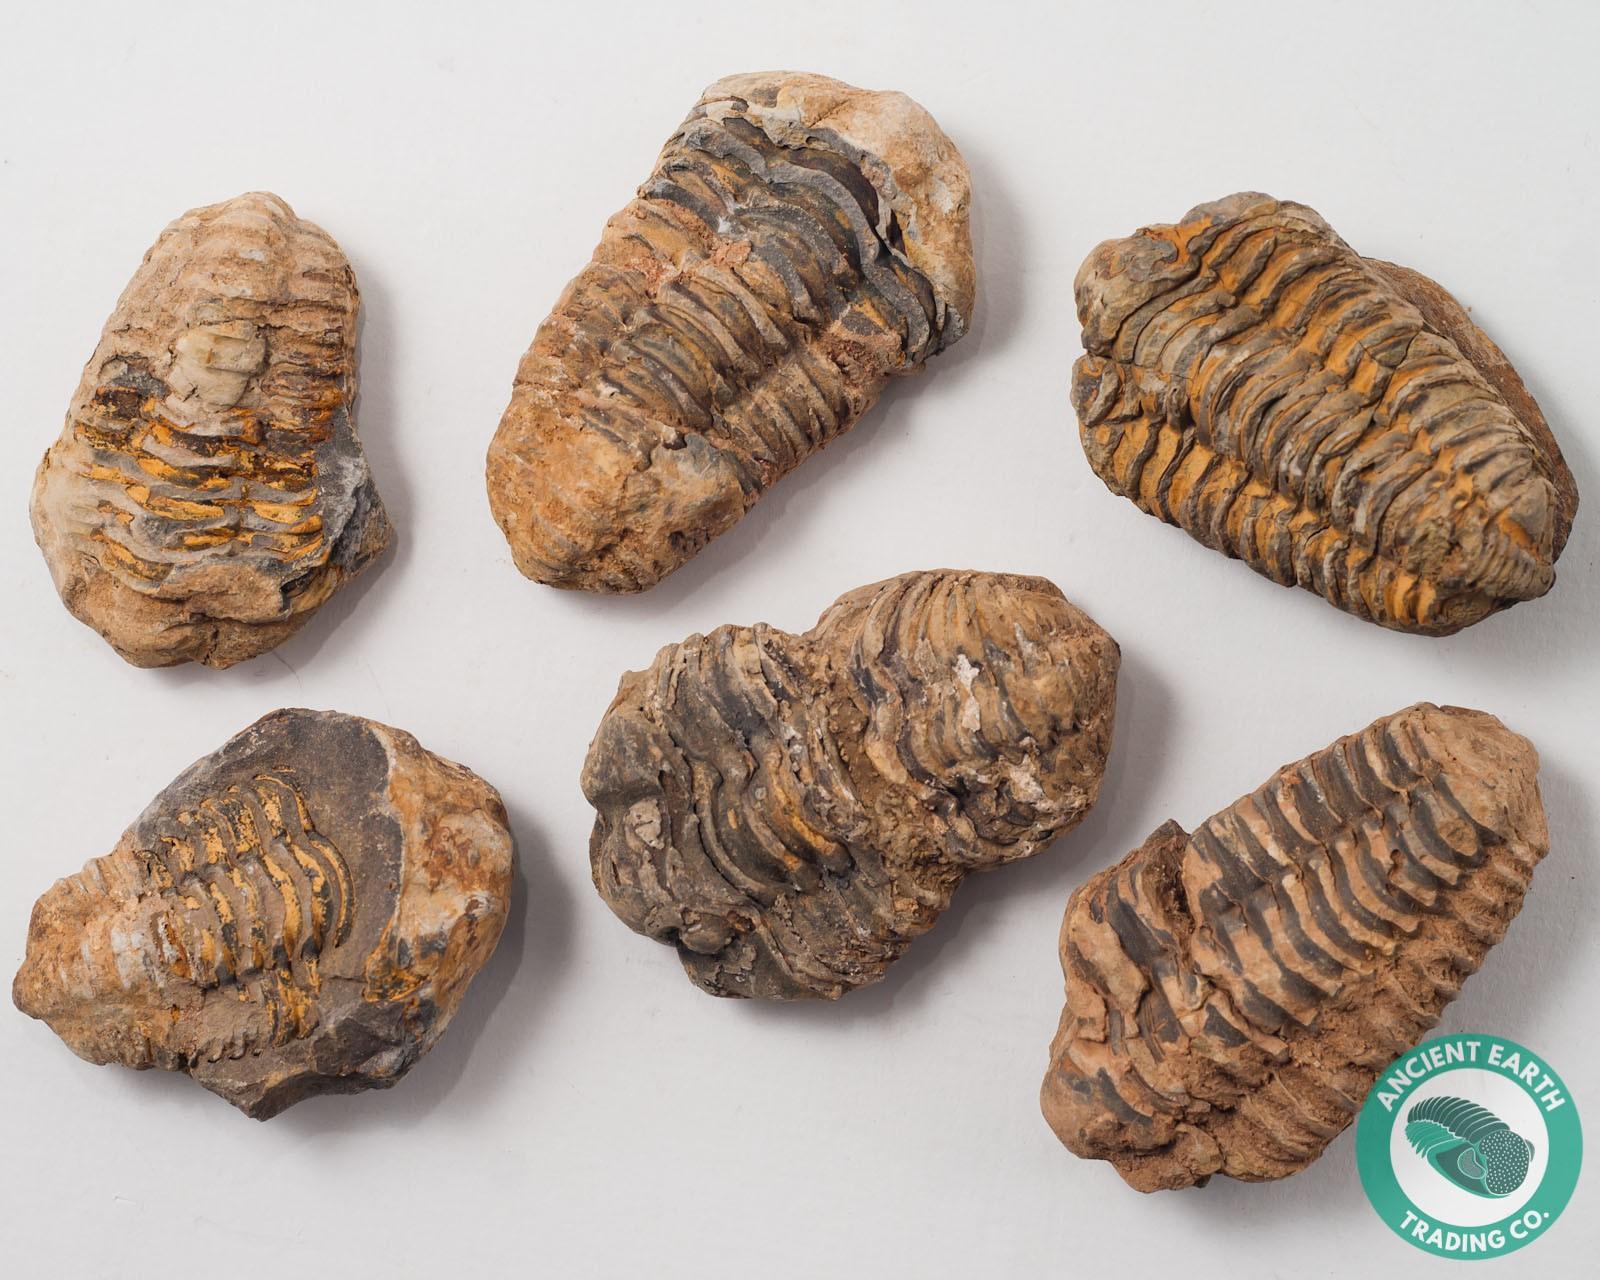 Flexicalymene Trilobite Fossil - 25 Pack - Morocco